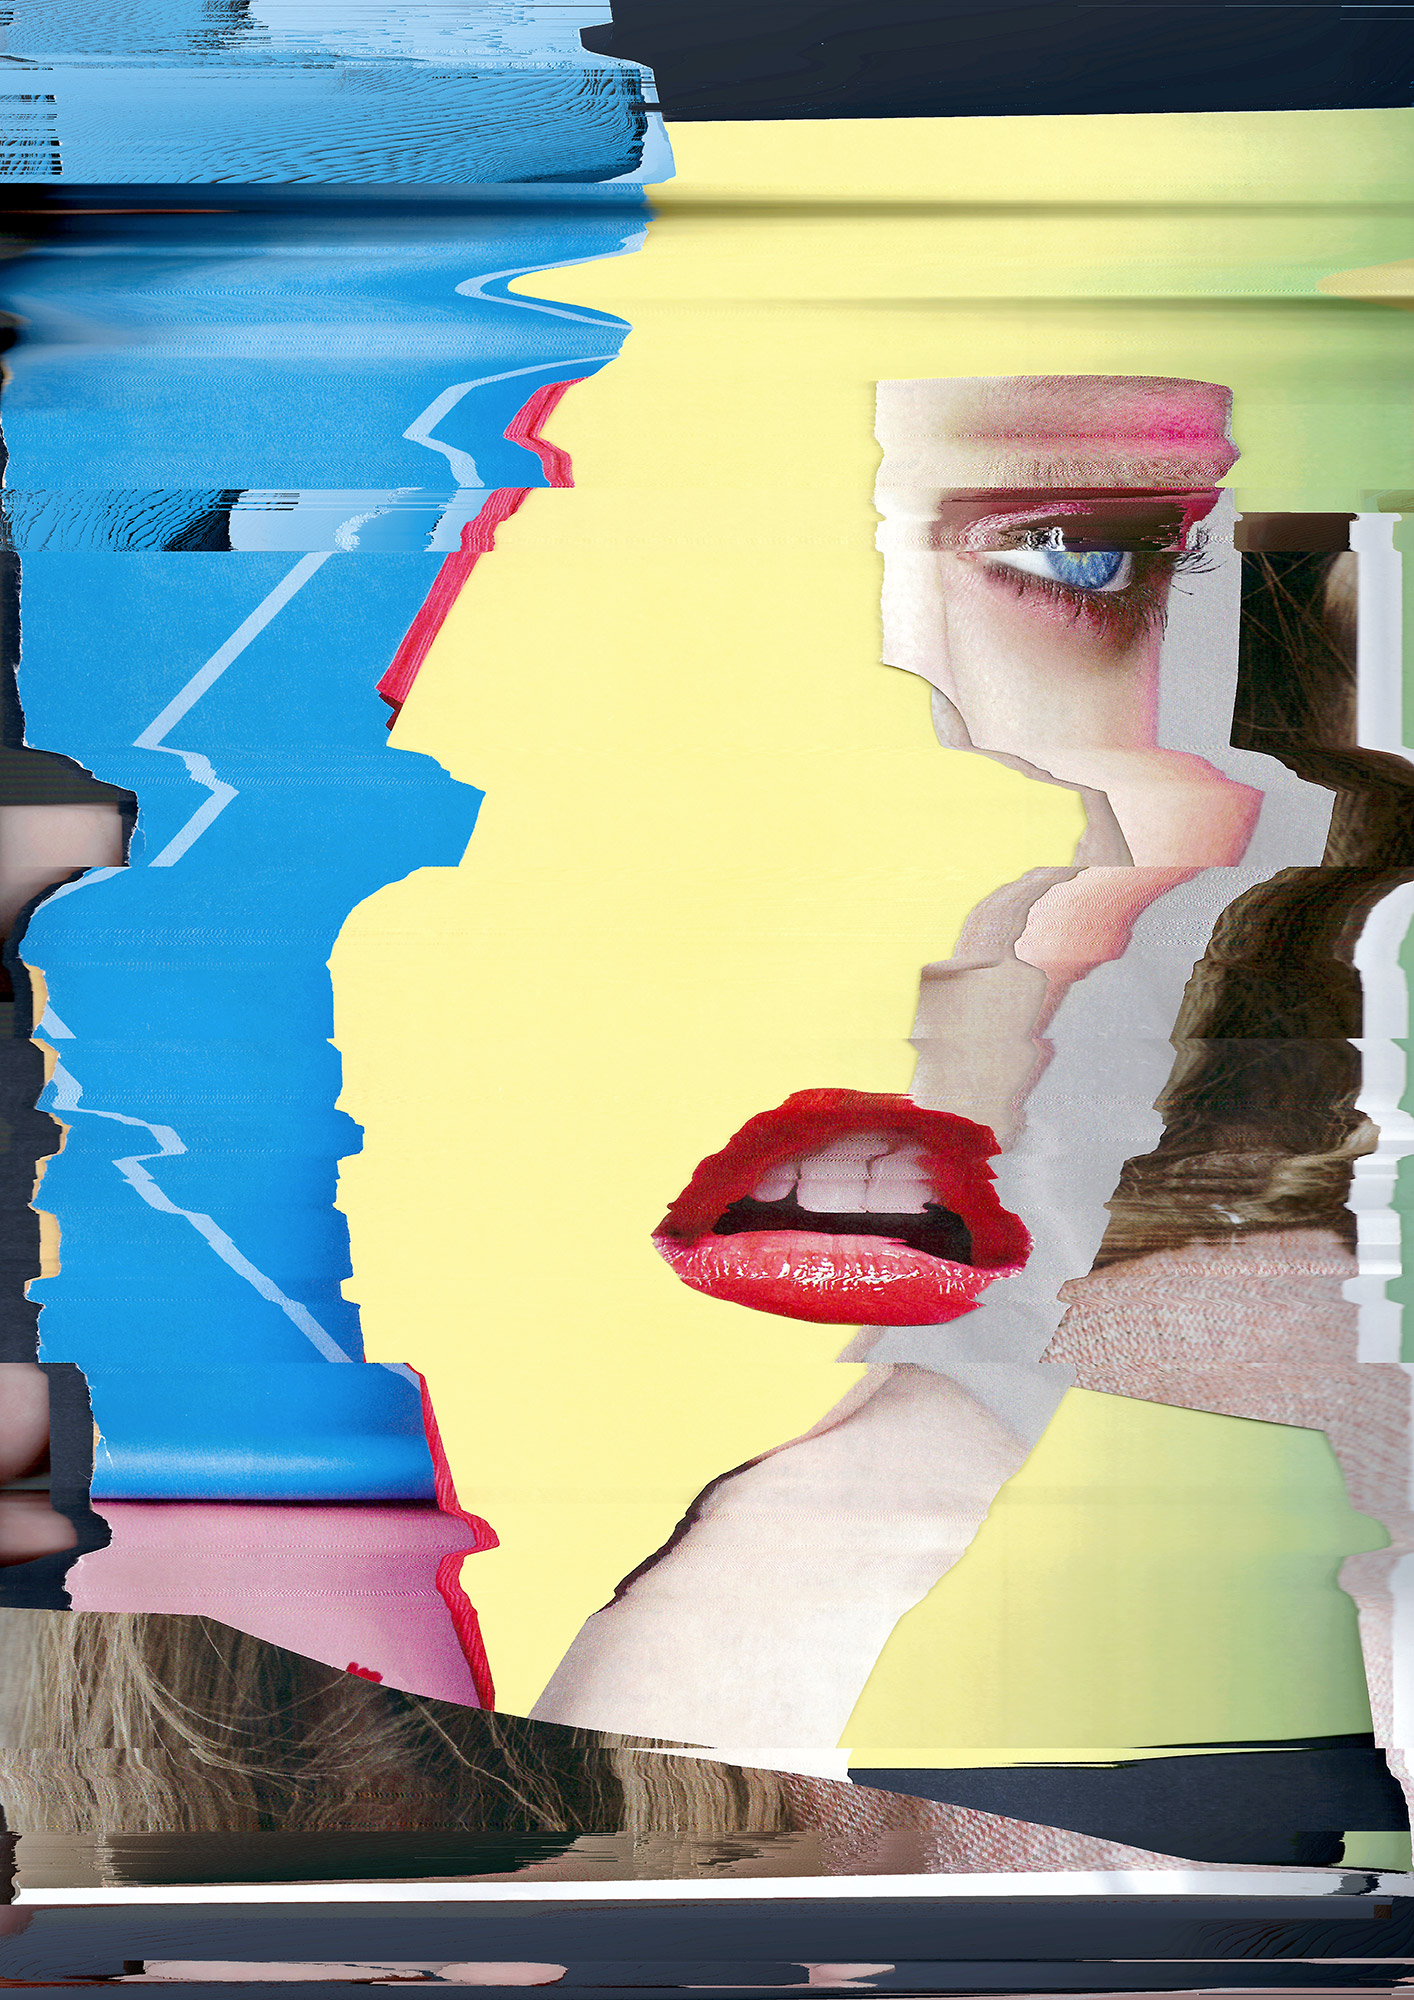 Ewa Doroszenko - Radical Beauty 14, photography